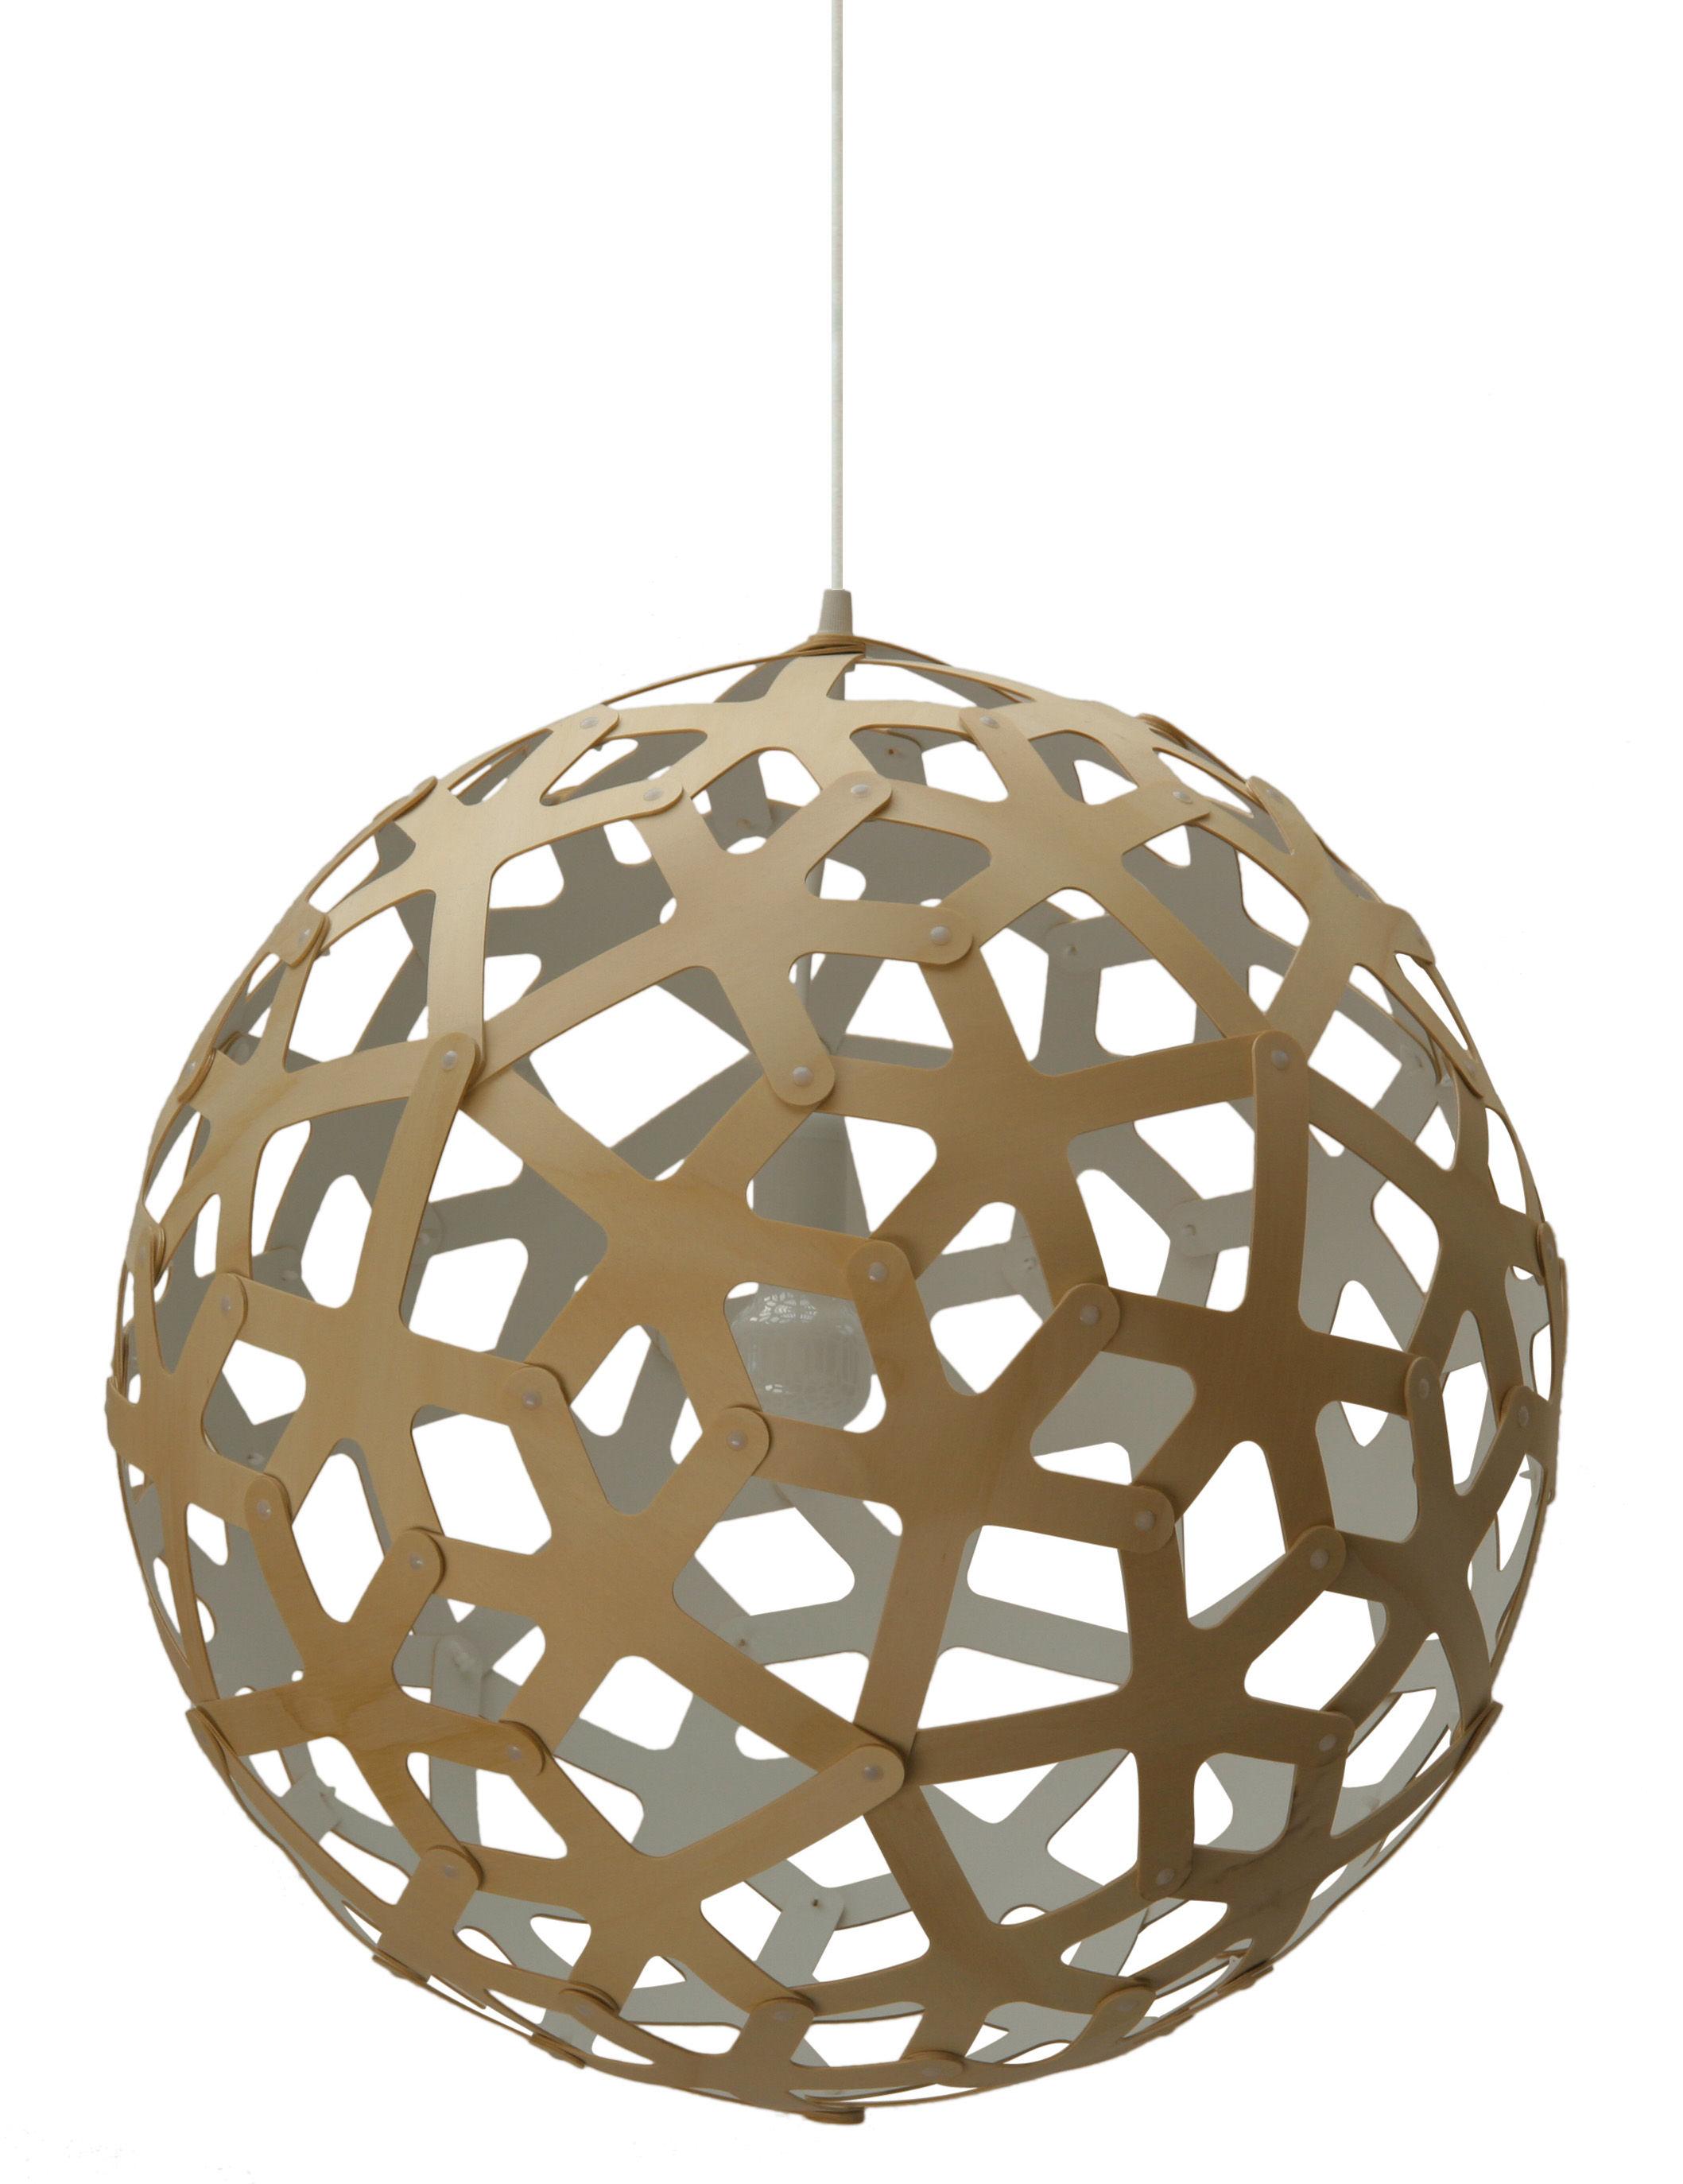 Lighting - Pendant Lighting - Coral Pendant - / Ø 60 cm - Bicoloured by David Trubridge - White / Natural wood - Pine